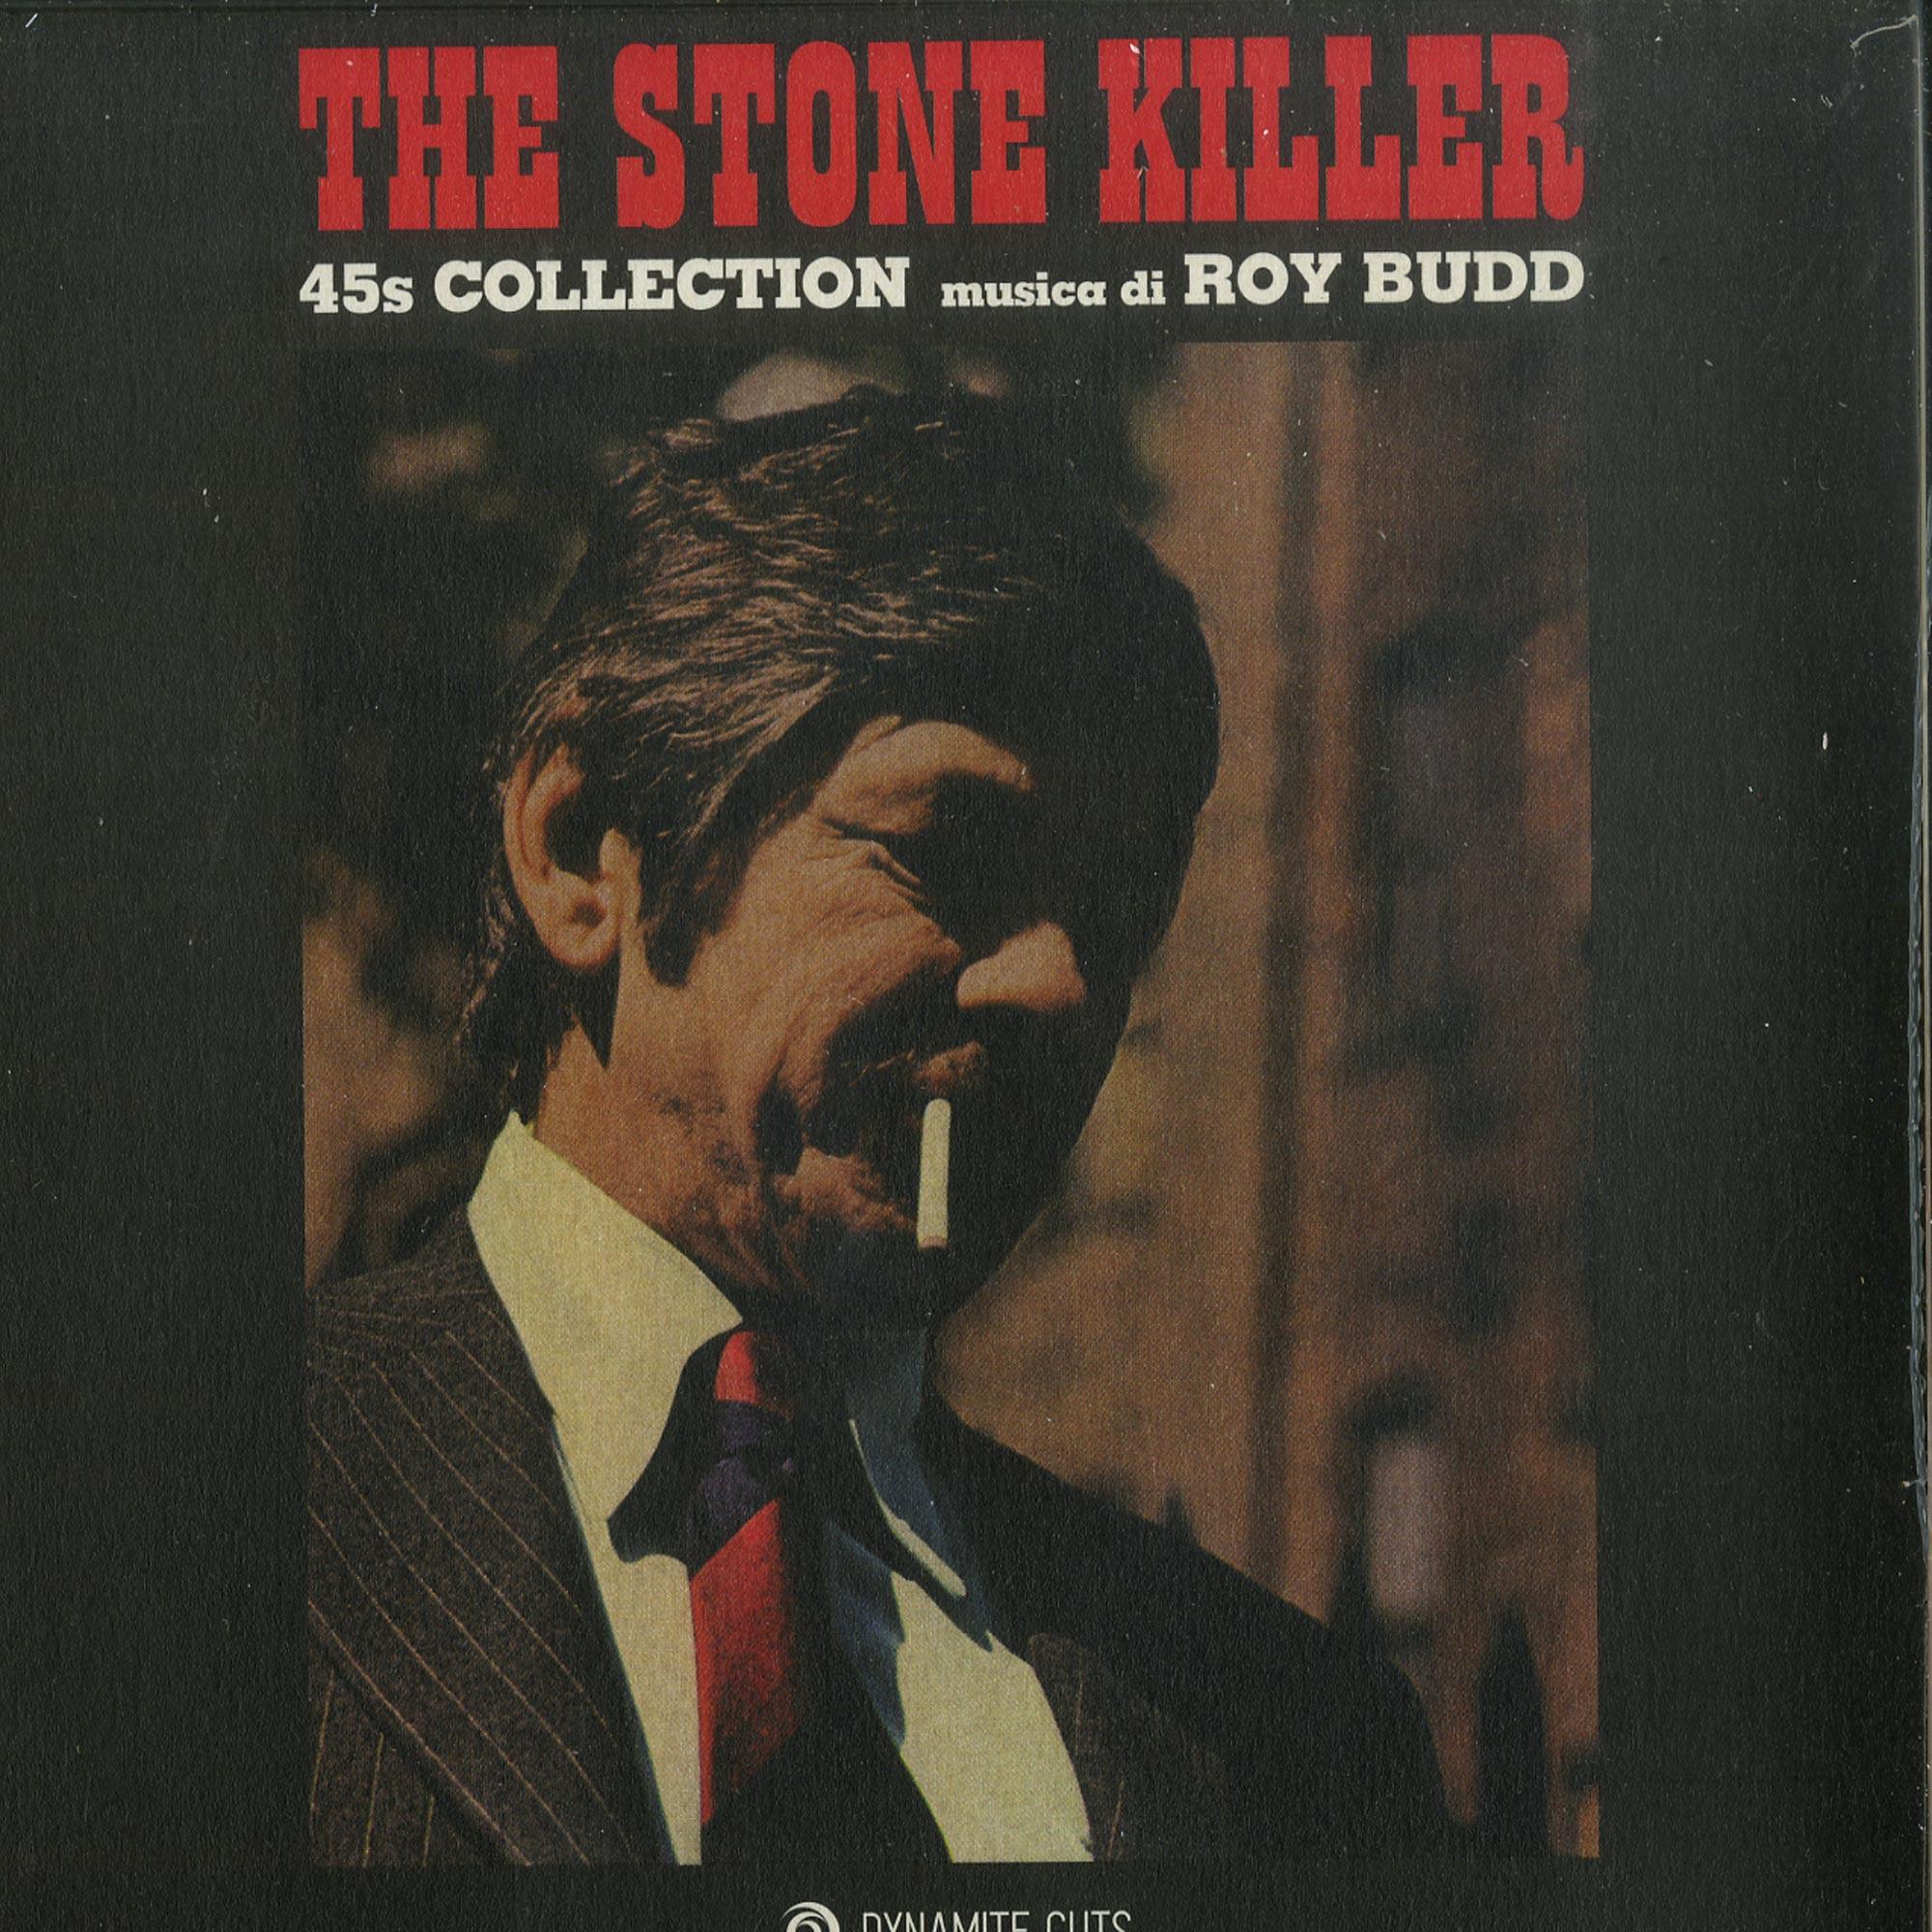 Roy Budd - THE STONE KILLER O.S.T.